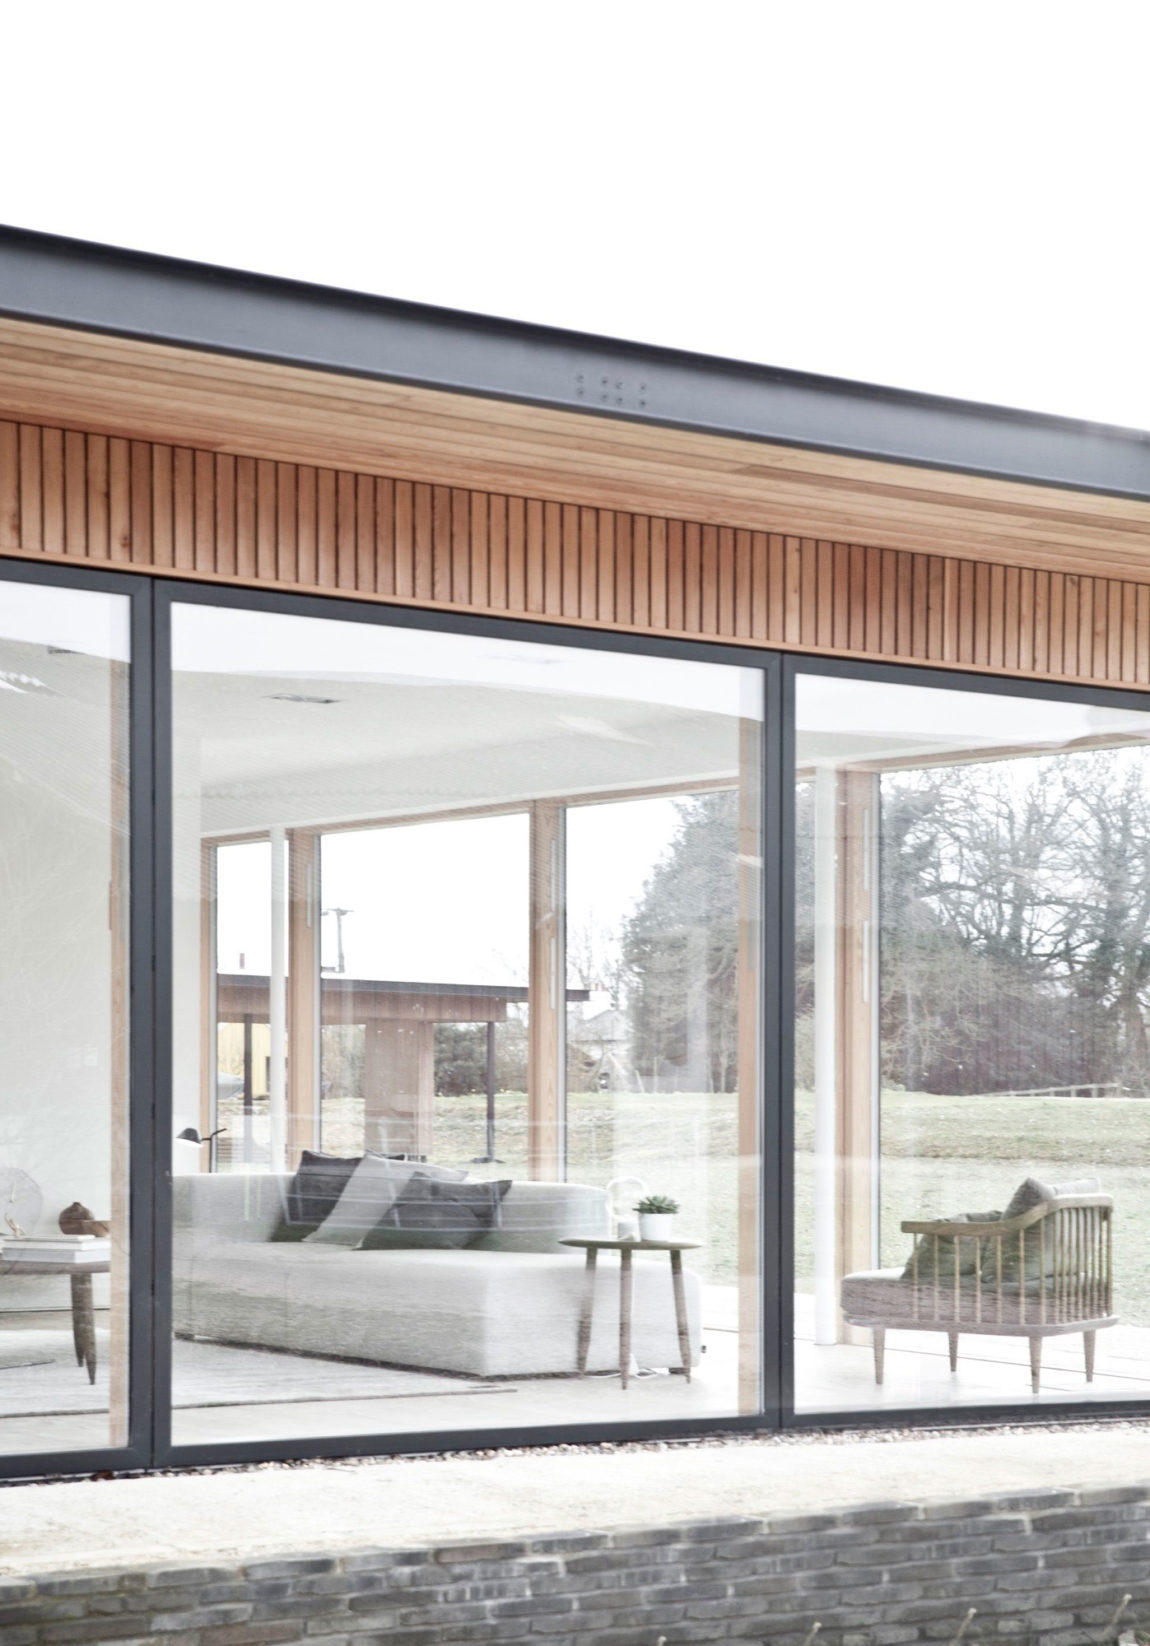 Reydon Grove Farm by NORM Architects (10)